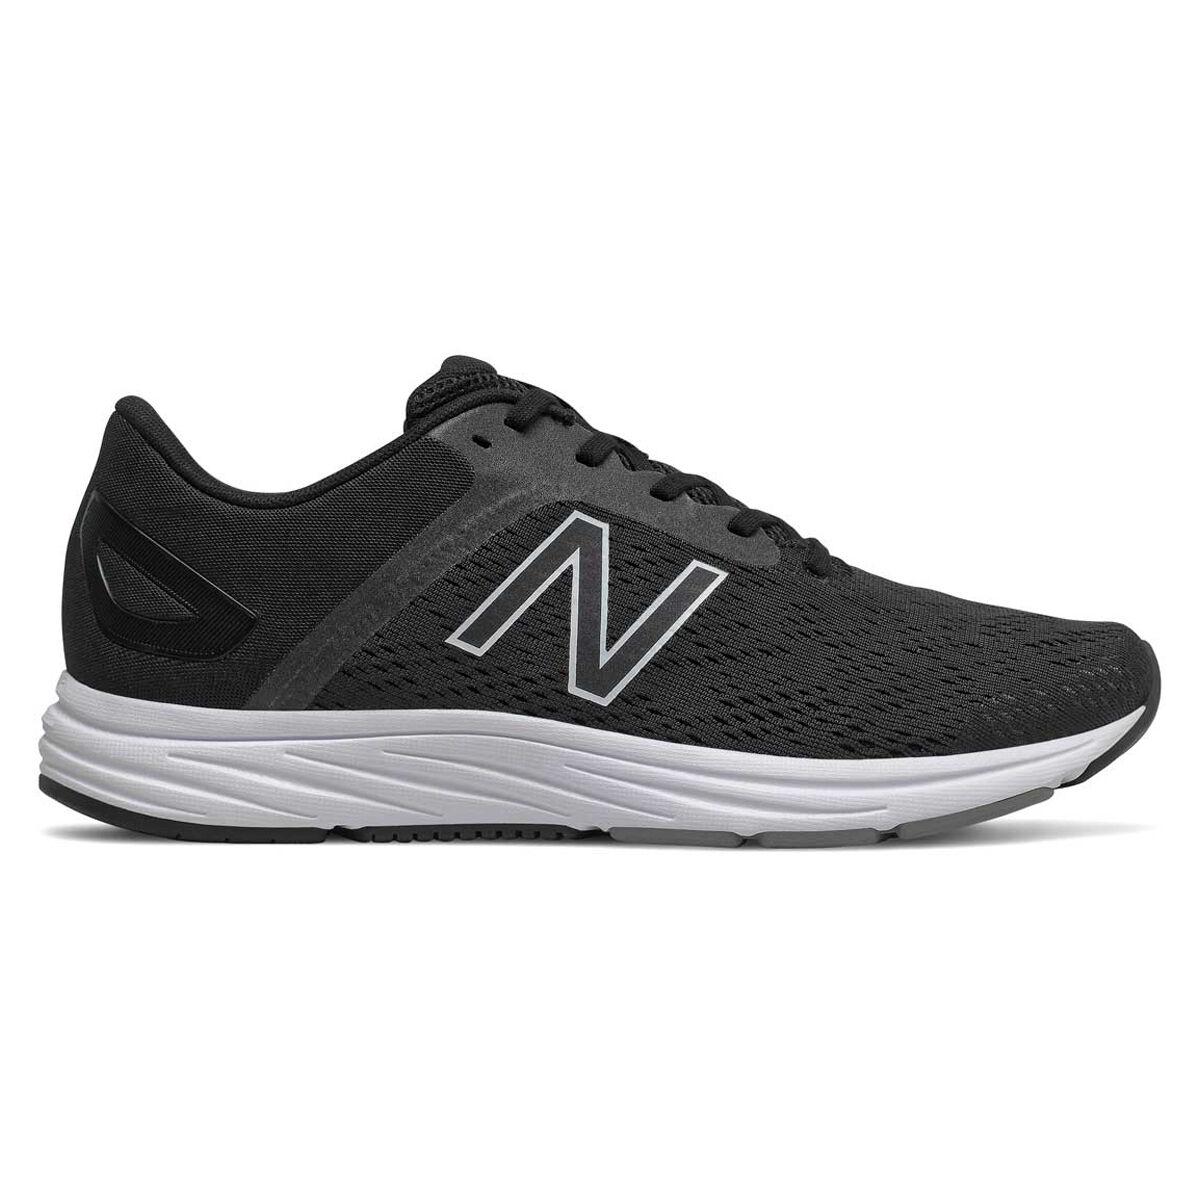 New Balance 480 2E Mens Running Shoes